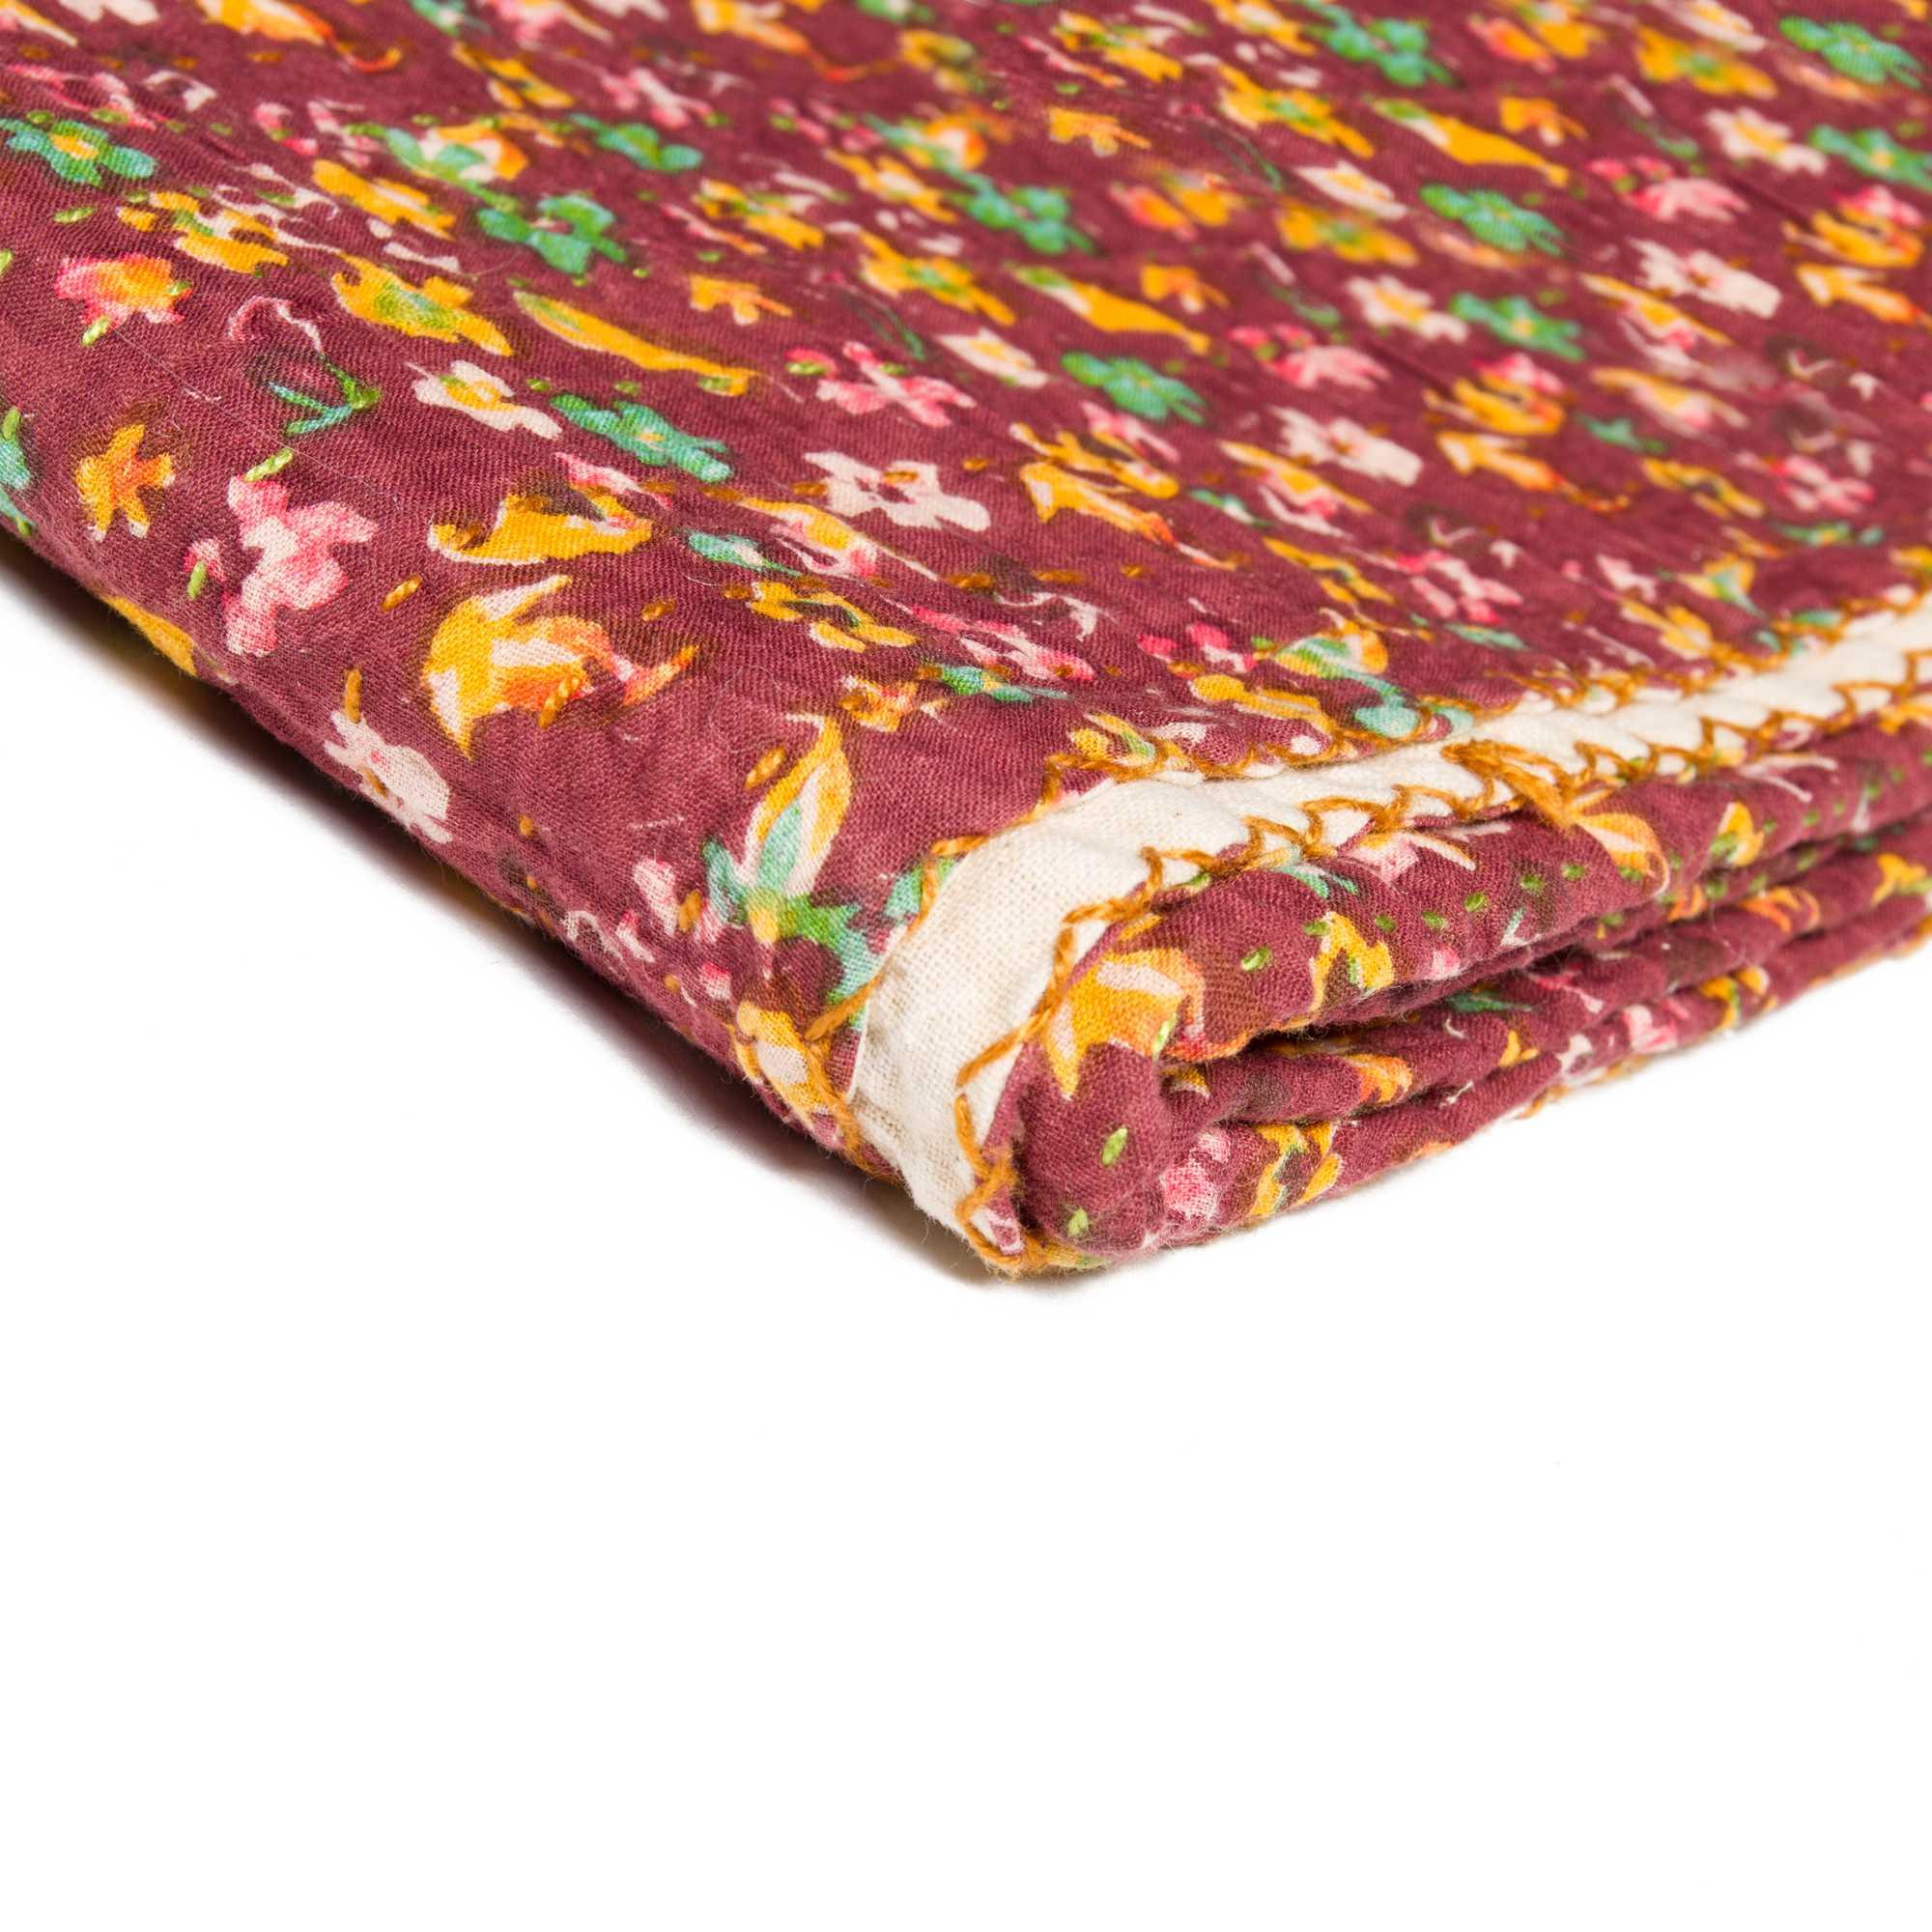 "50"" X 70"" Maroon Warm And Soft Kantha Cotton Throw Blanket"